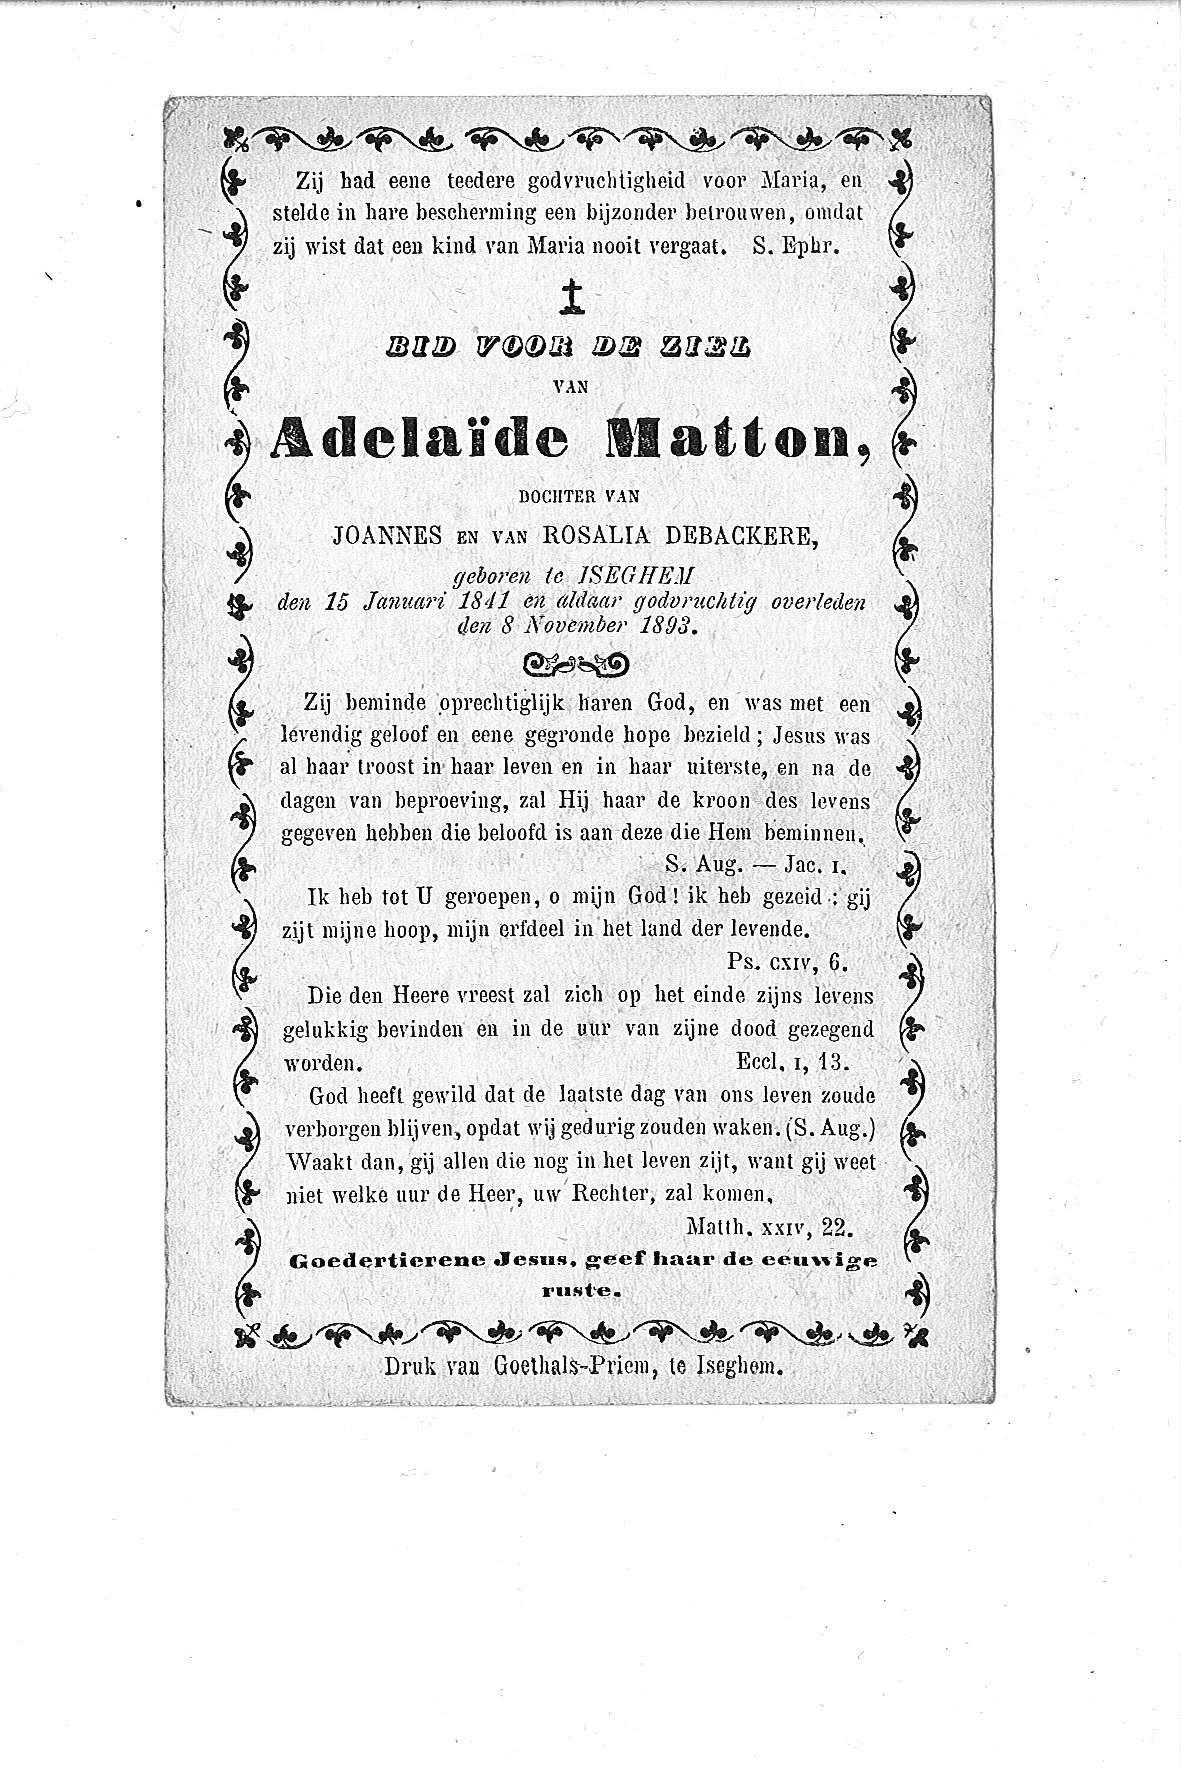 Adelaïde(1893)20100204140955_00005.jpg